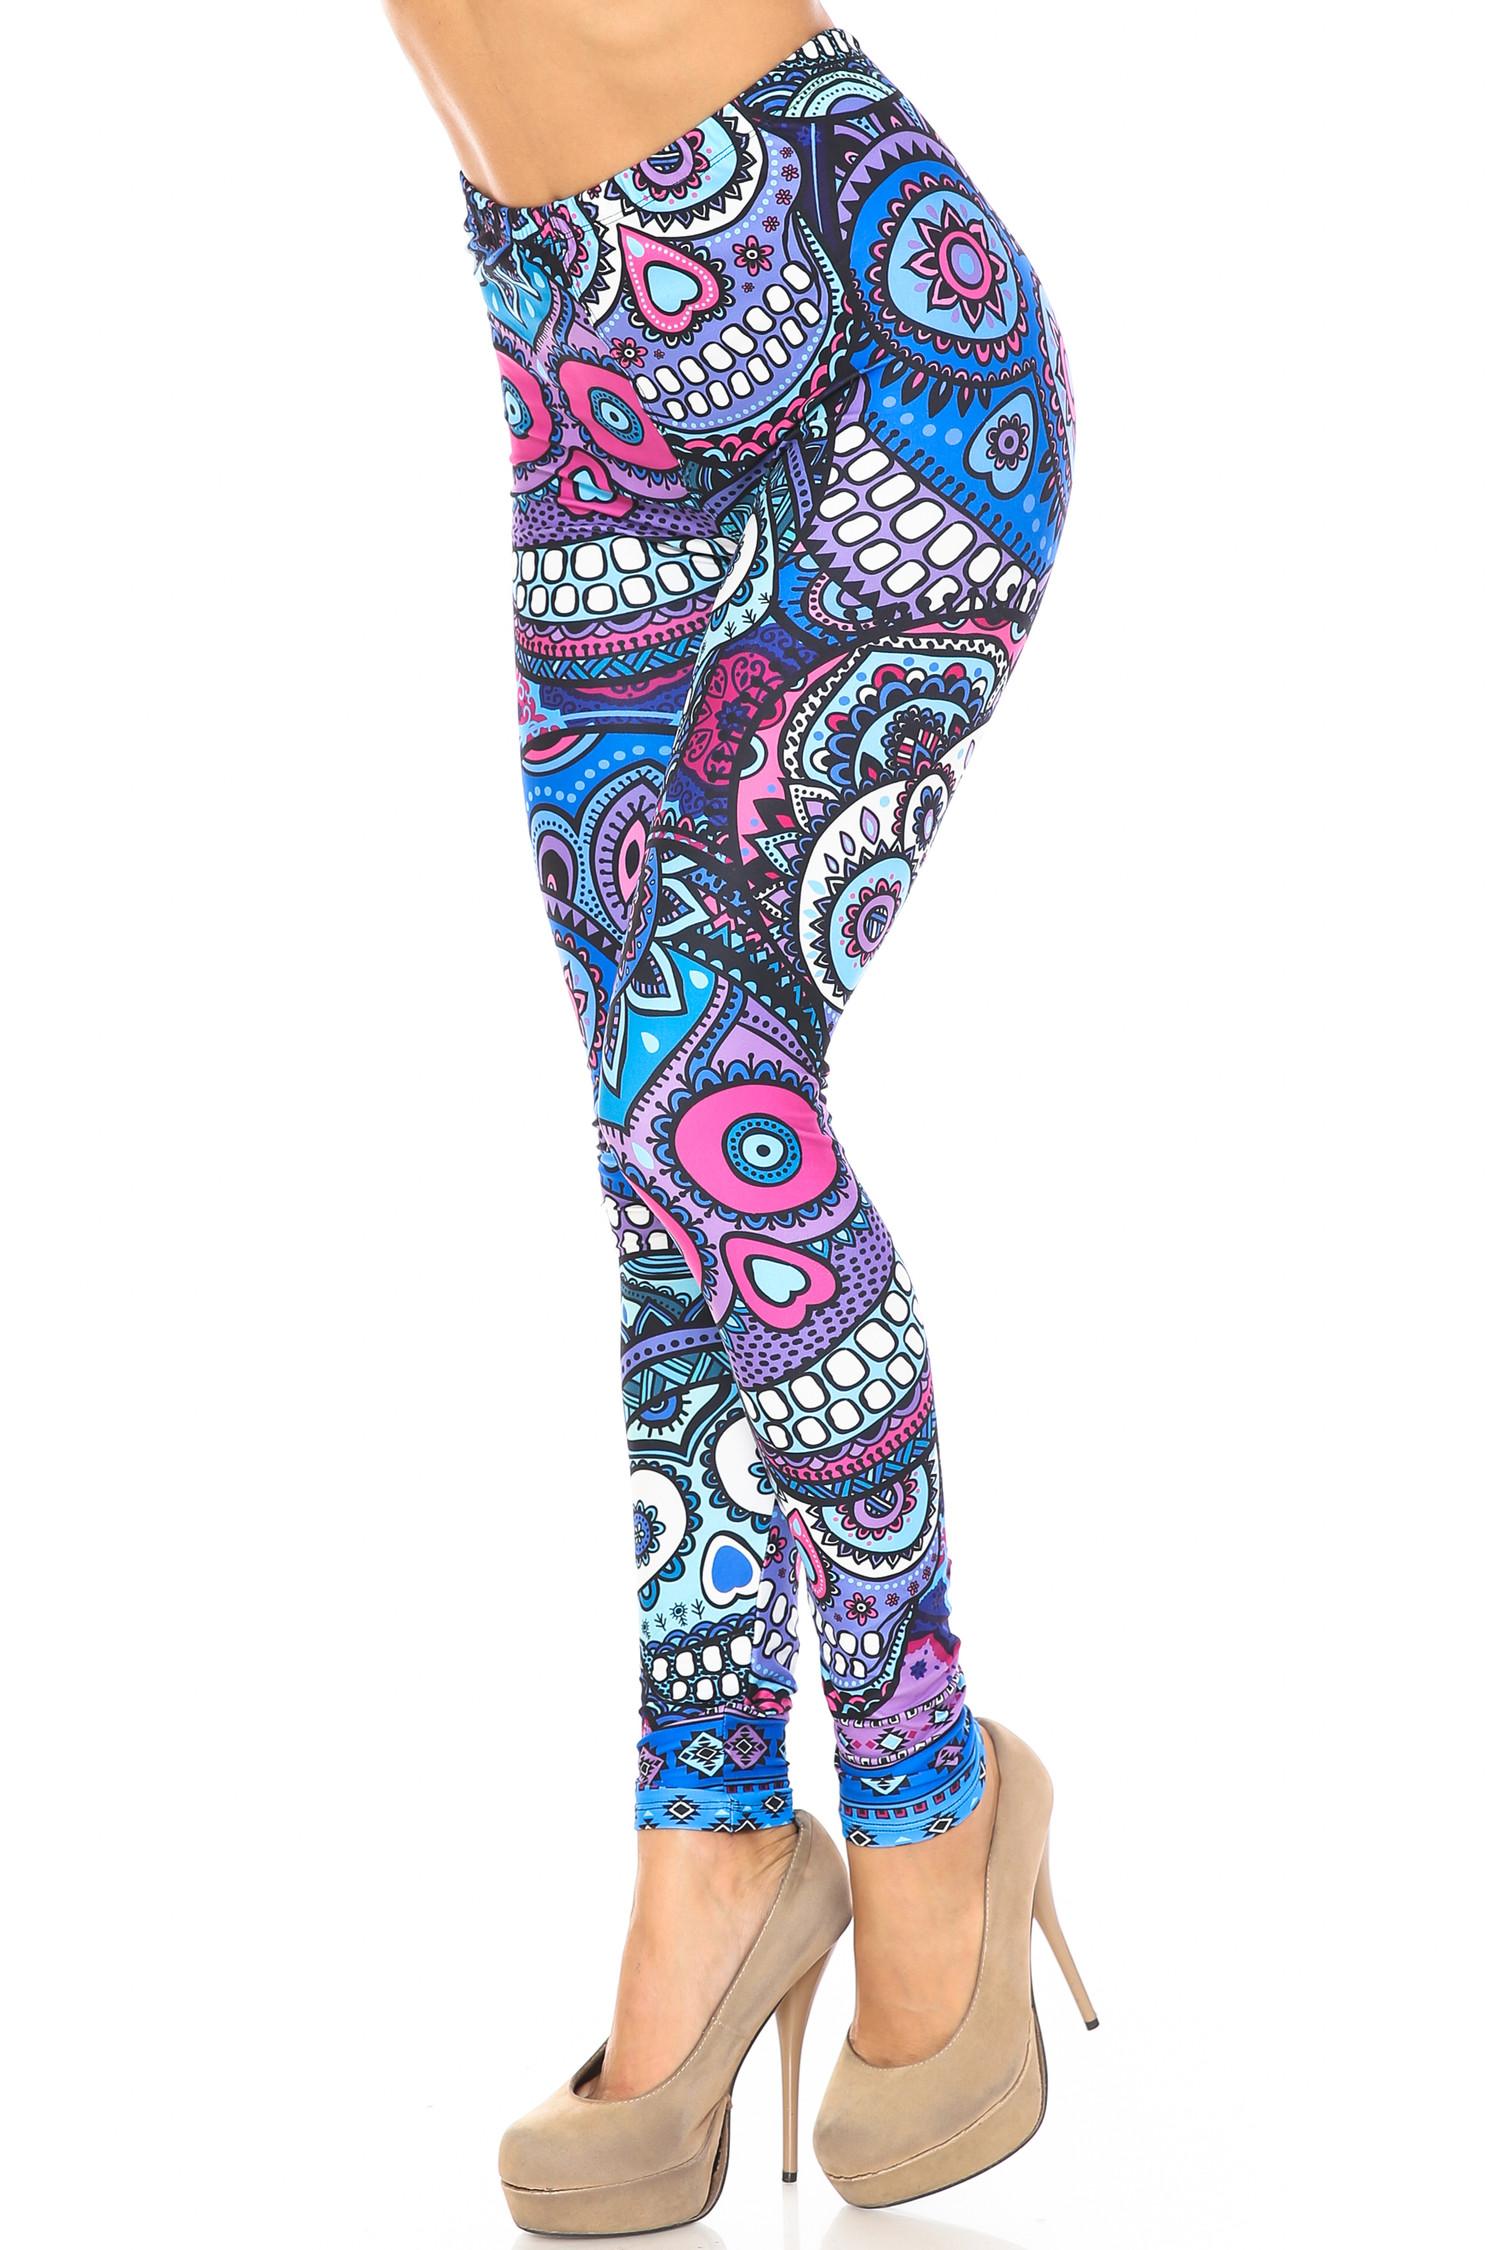 Creamy Soft Jumbo Purple Sugar Skulls Leggings - By USA Fashion™